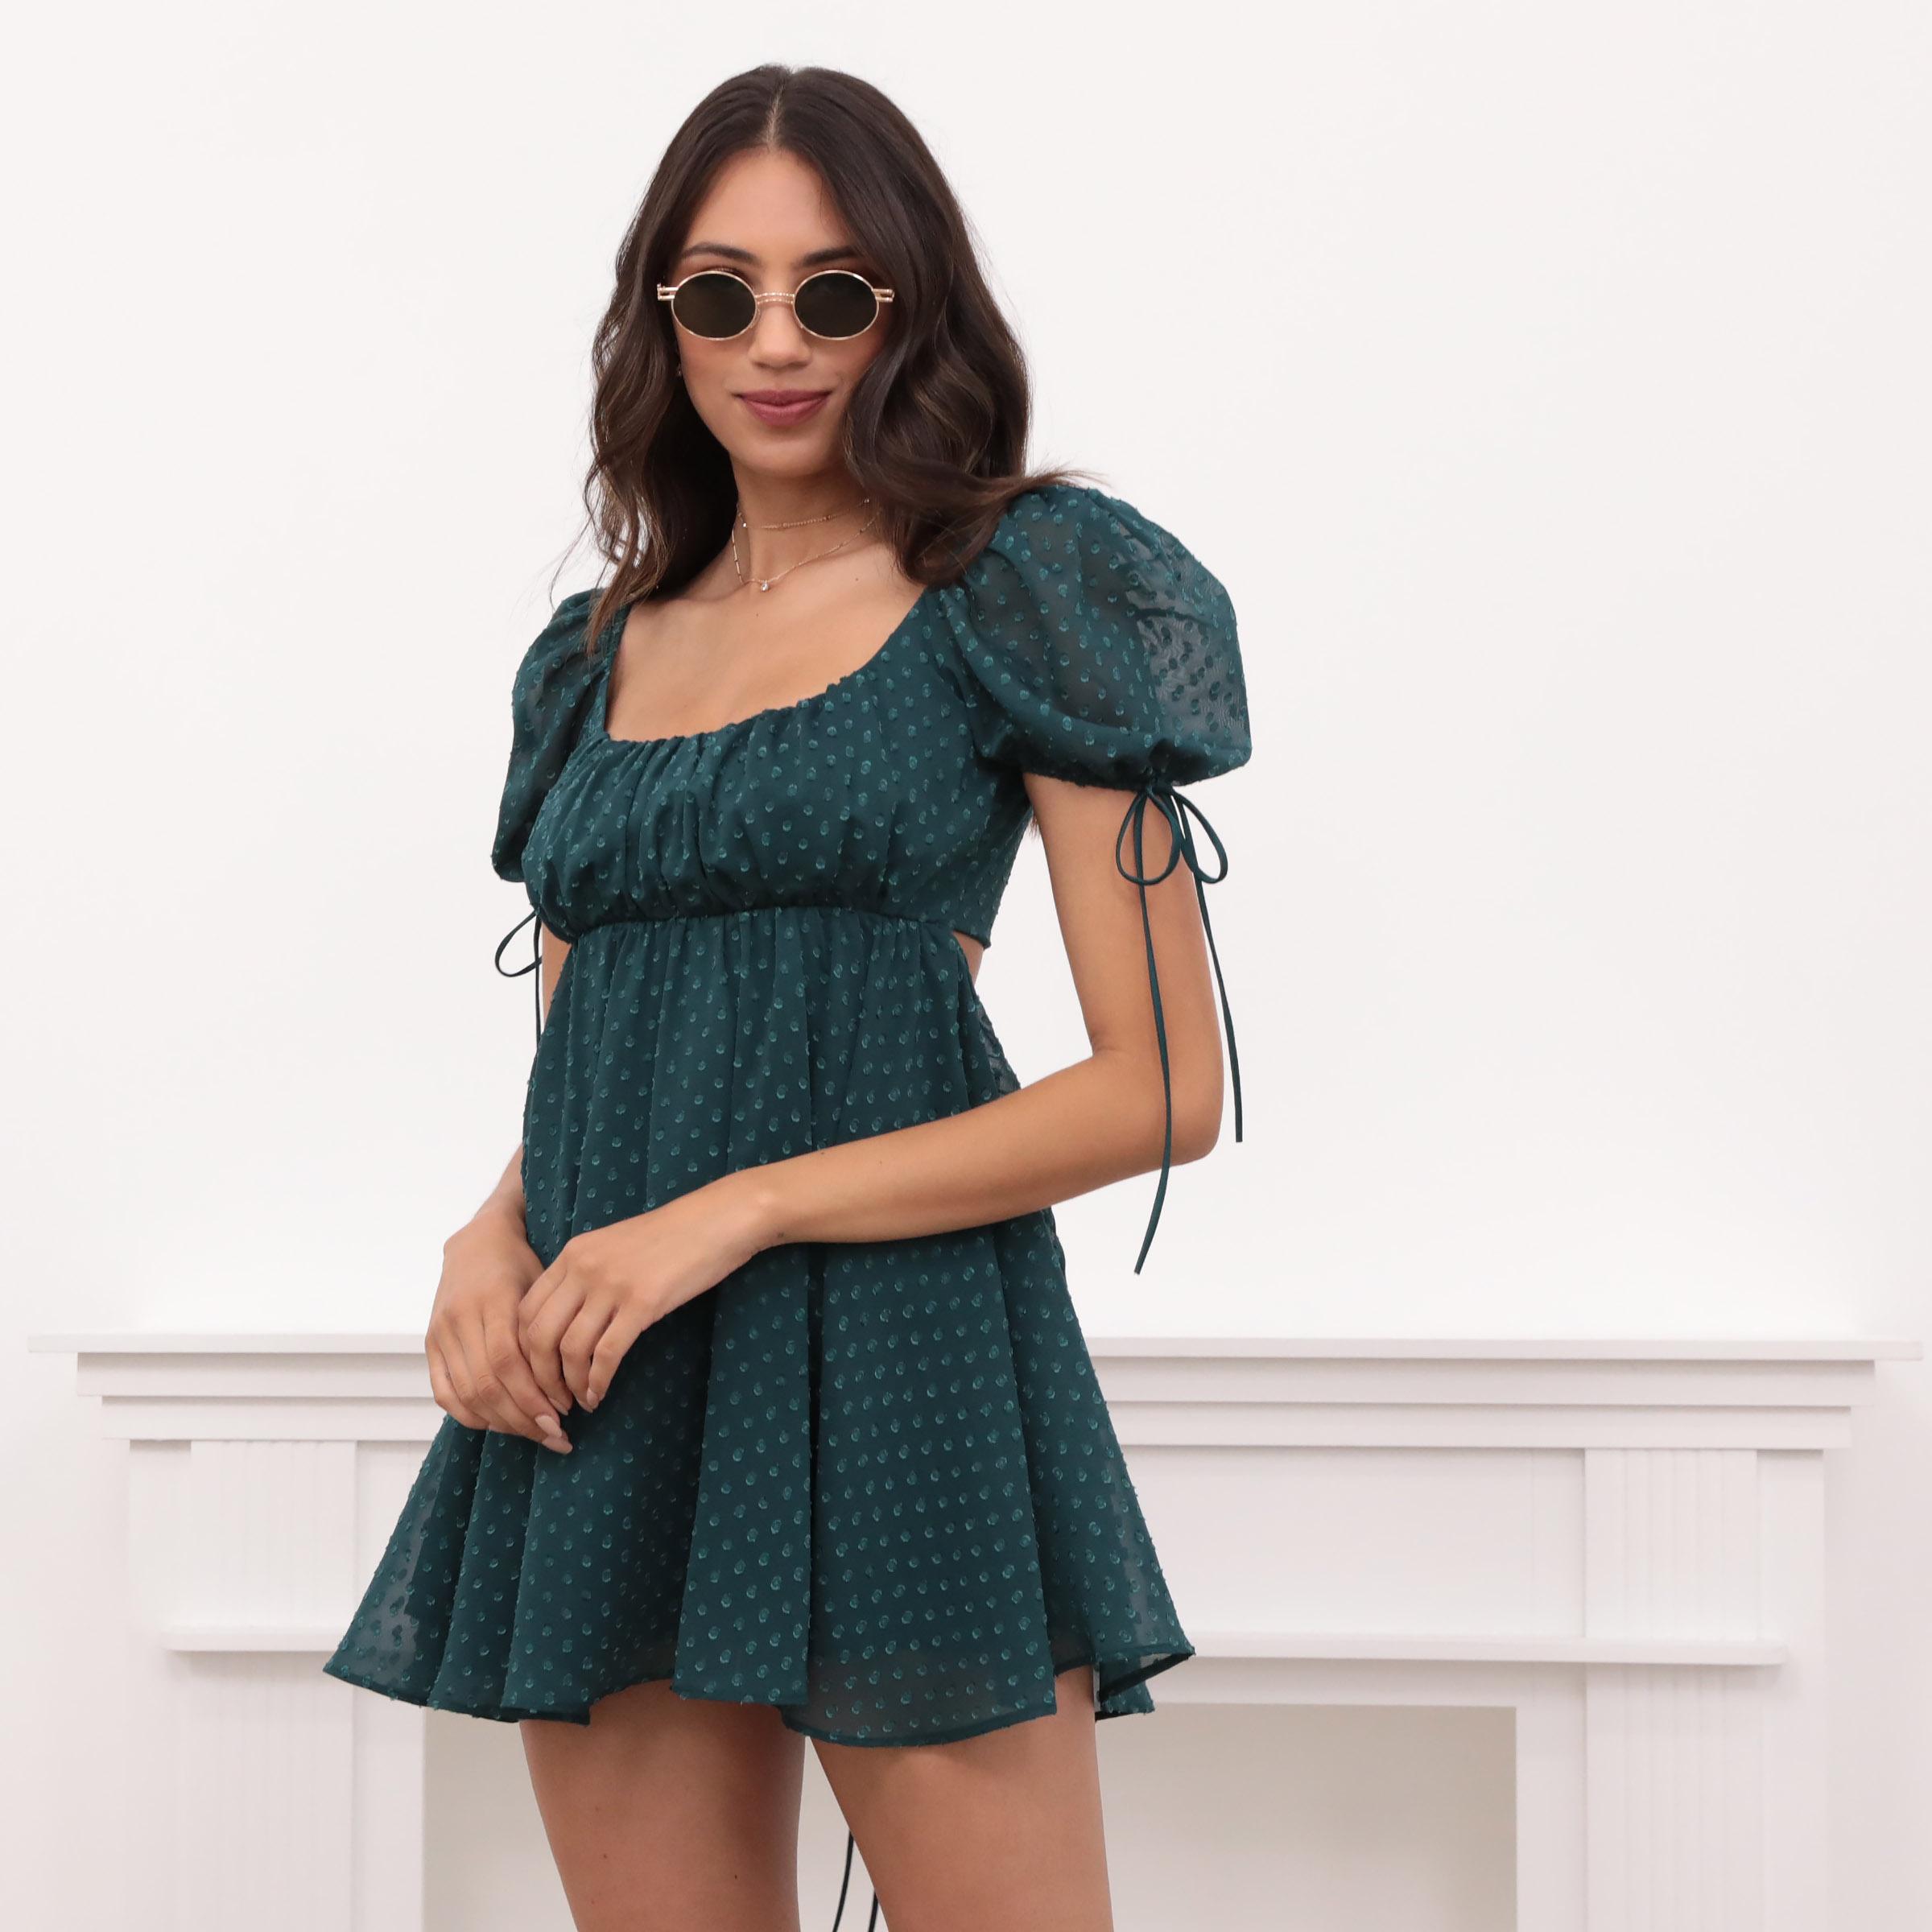 Leilani Dotted Chiffon Babydoll Dress in Hunter Green